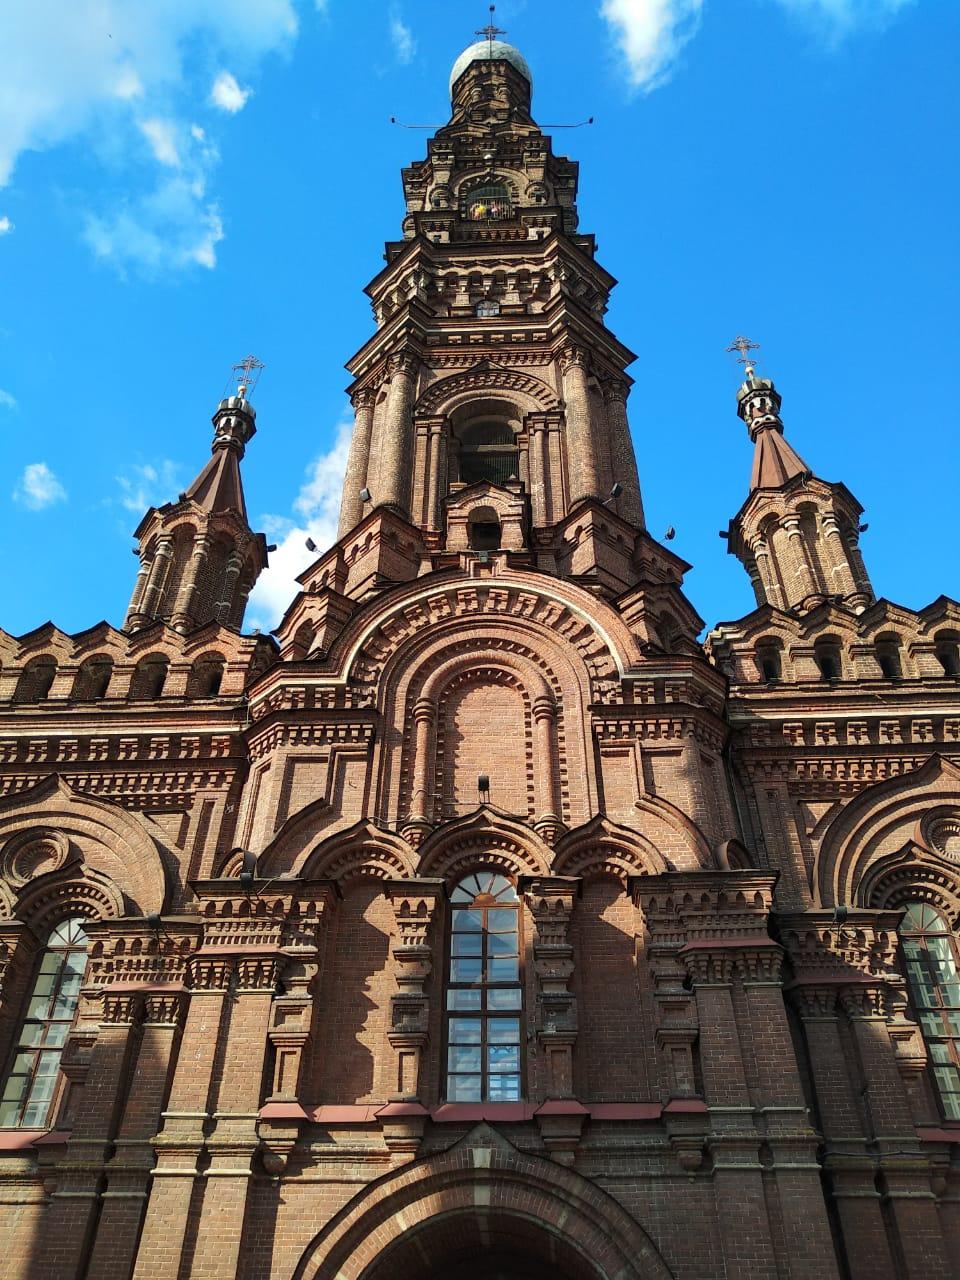 Башня в Казани. Блиц: башни